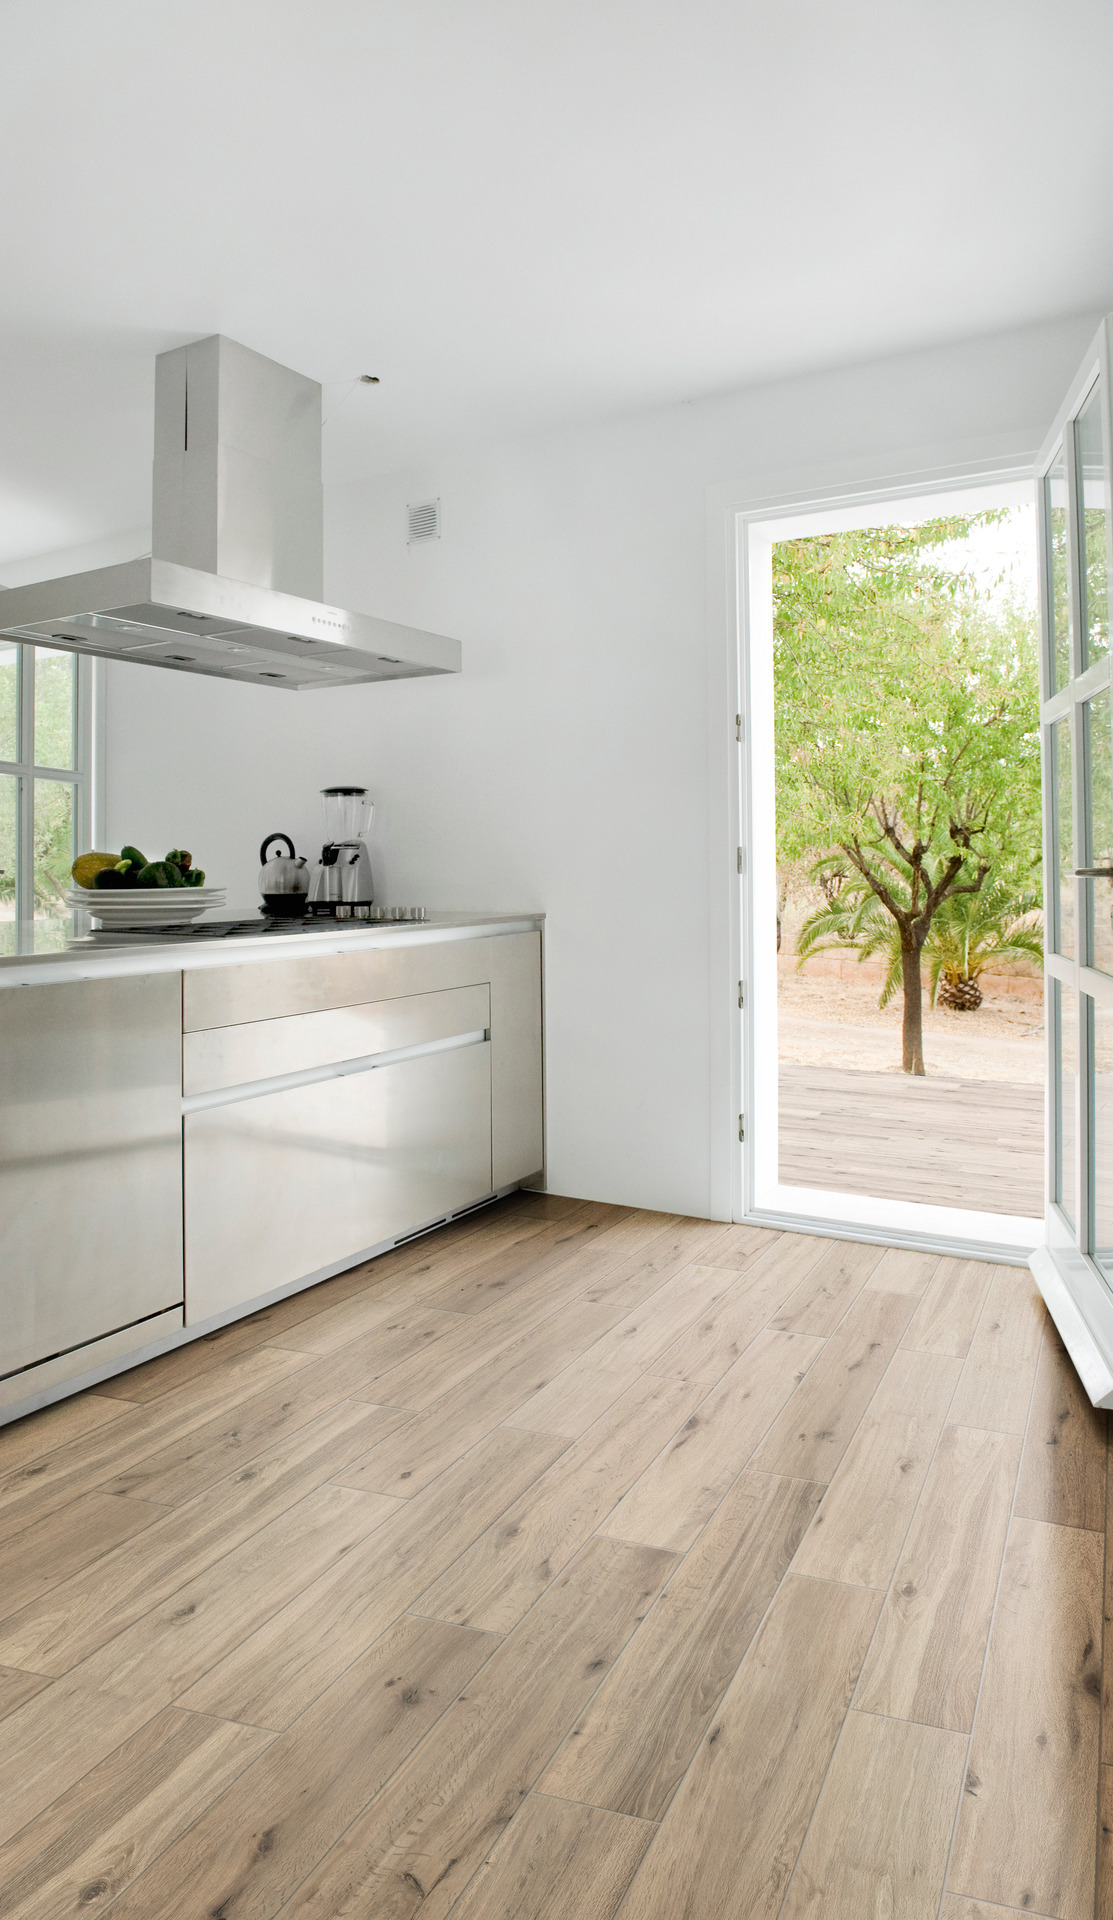 Treverkview gres imitaci n madera marazzi for Imitacion azulejos cocina